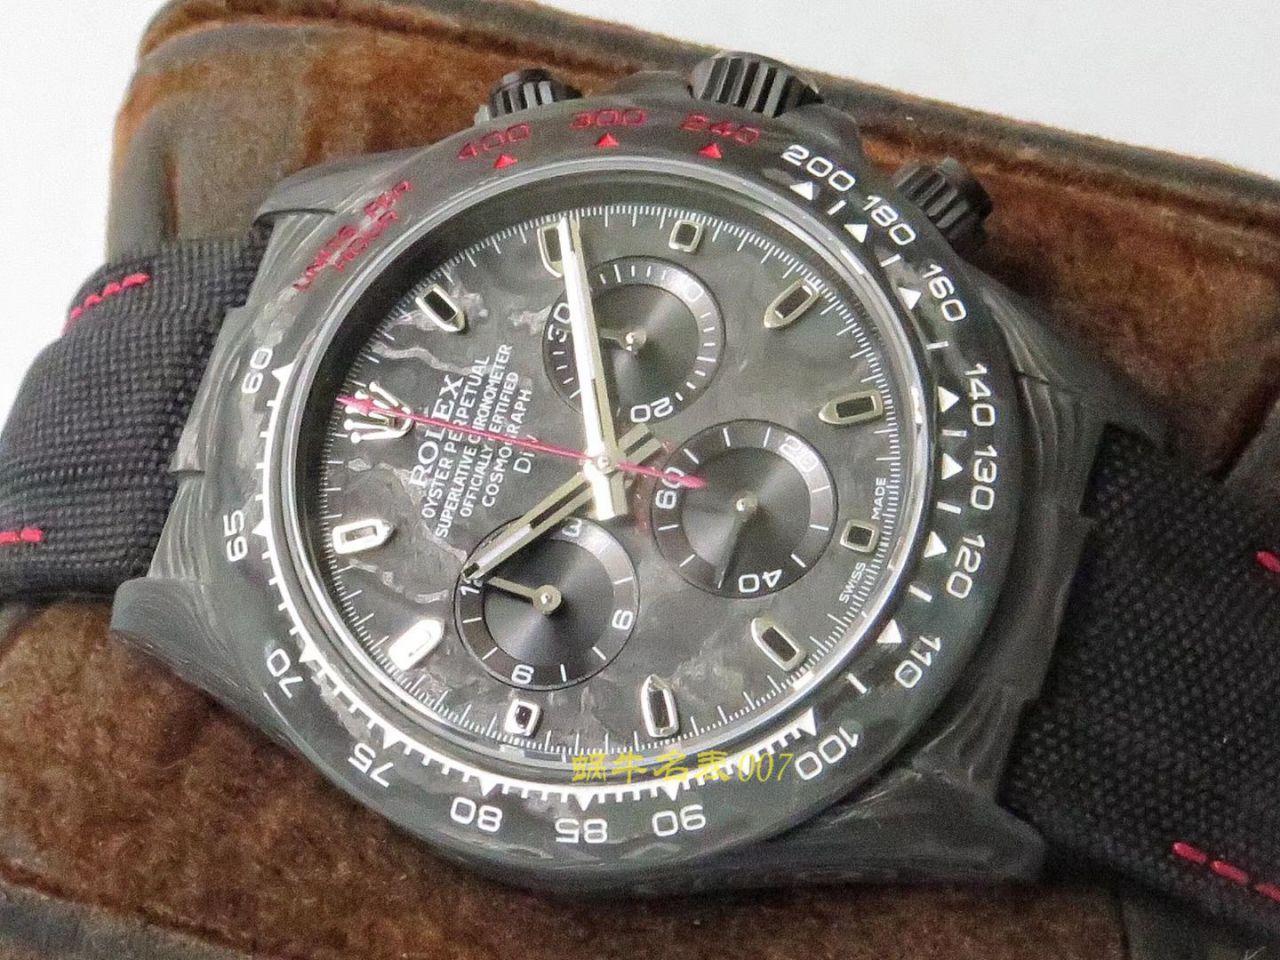 【TW厂劳力士复刻手表】劳力士ROLEX宇宙计时迪通拿系列之全碳纤维海外定制版